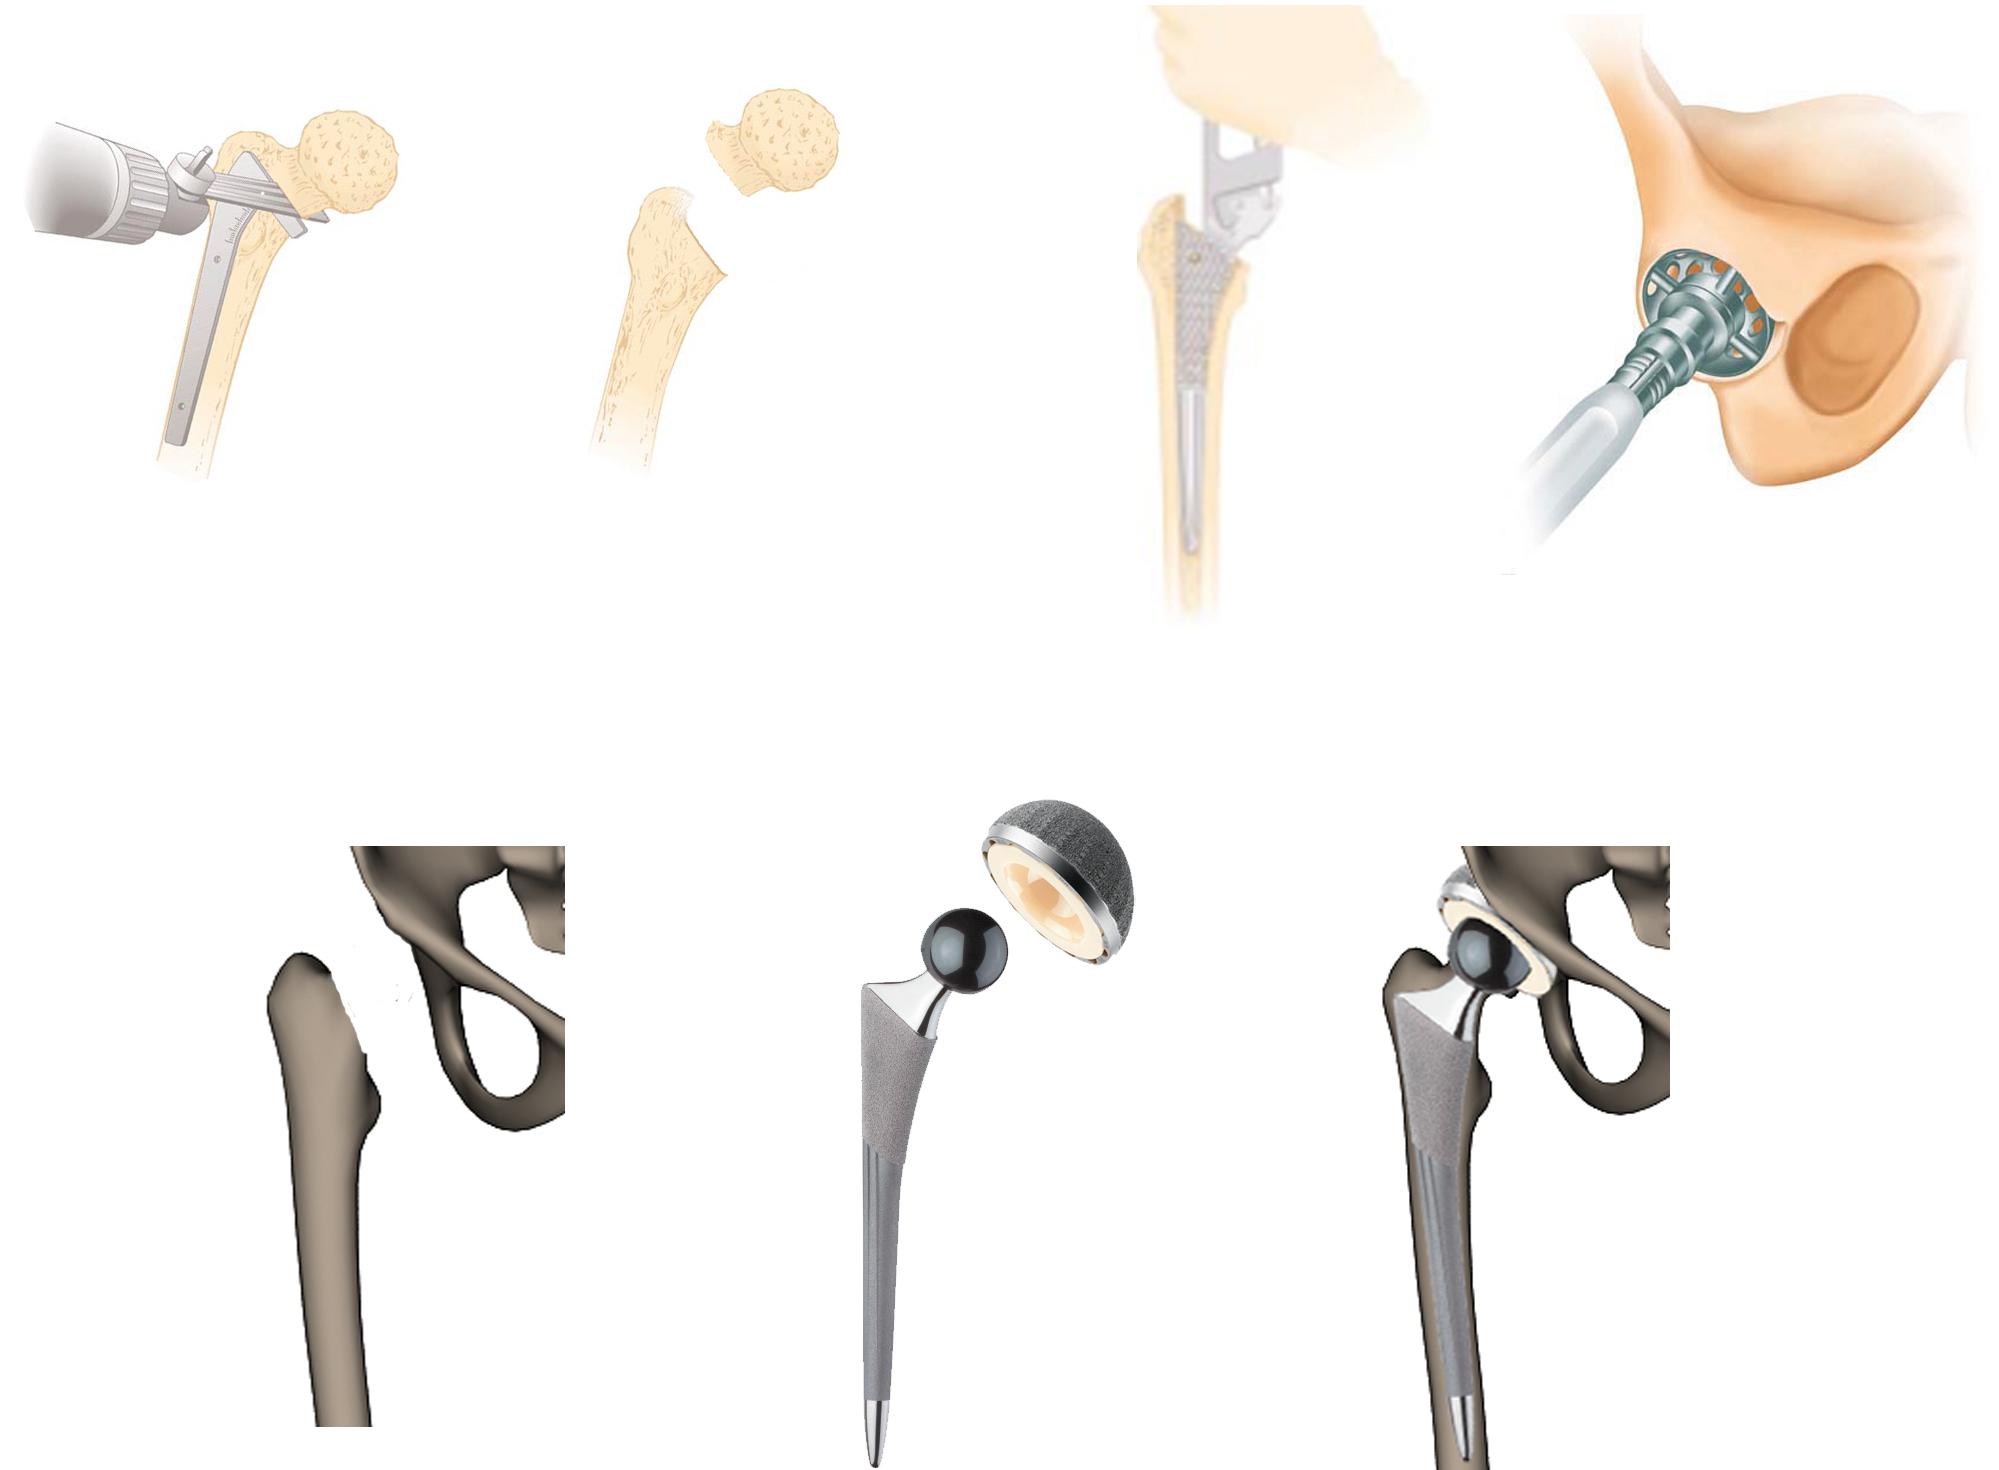 Prótesis de cadera en México